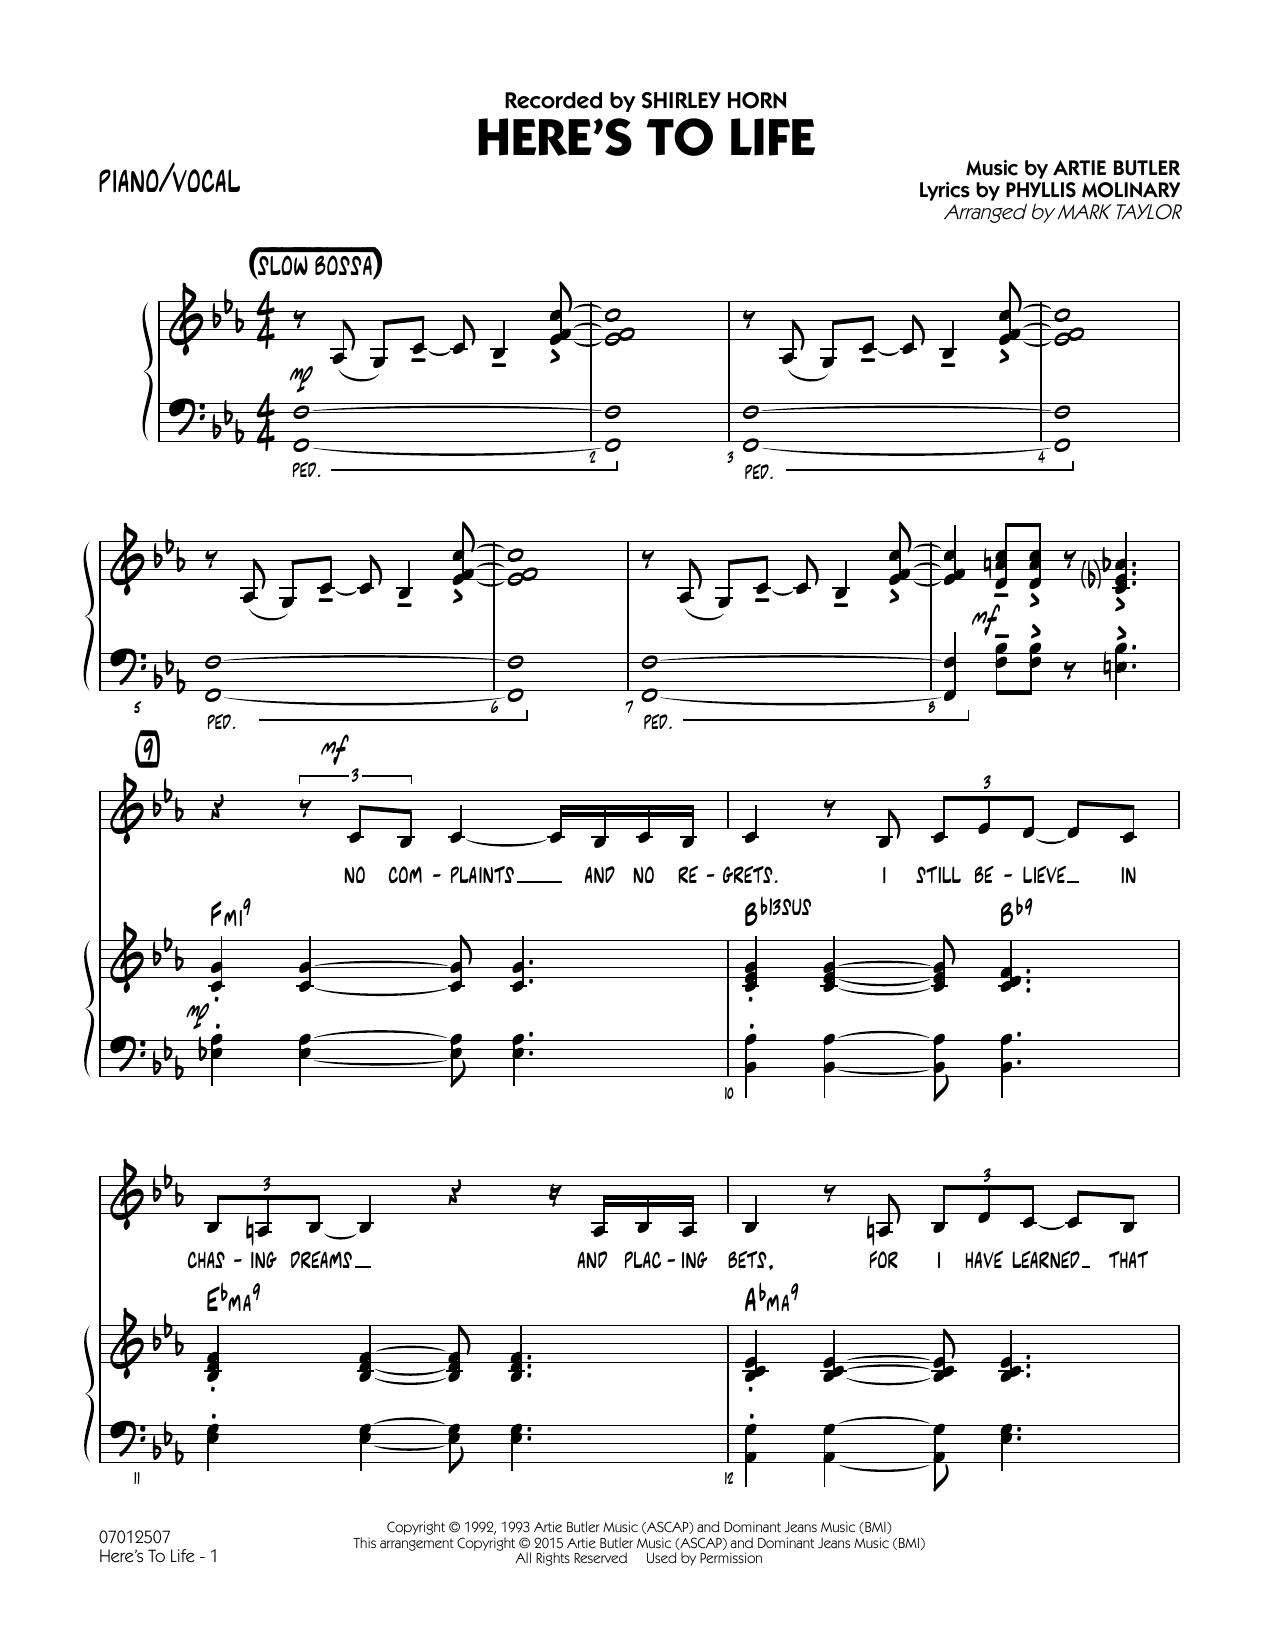 Here's To Life (Key: C minor) - Piano/Vocal (Jazz Ensemble)